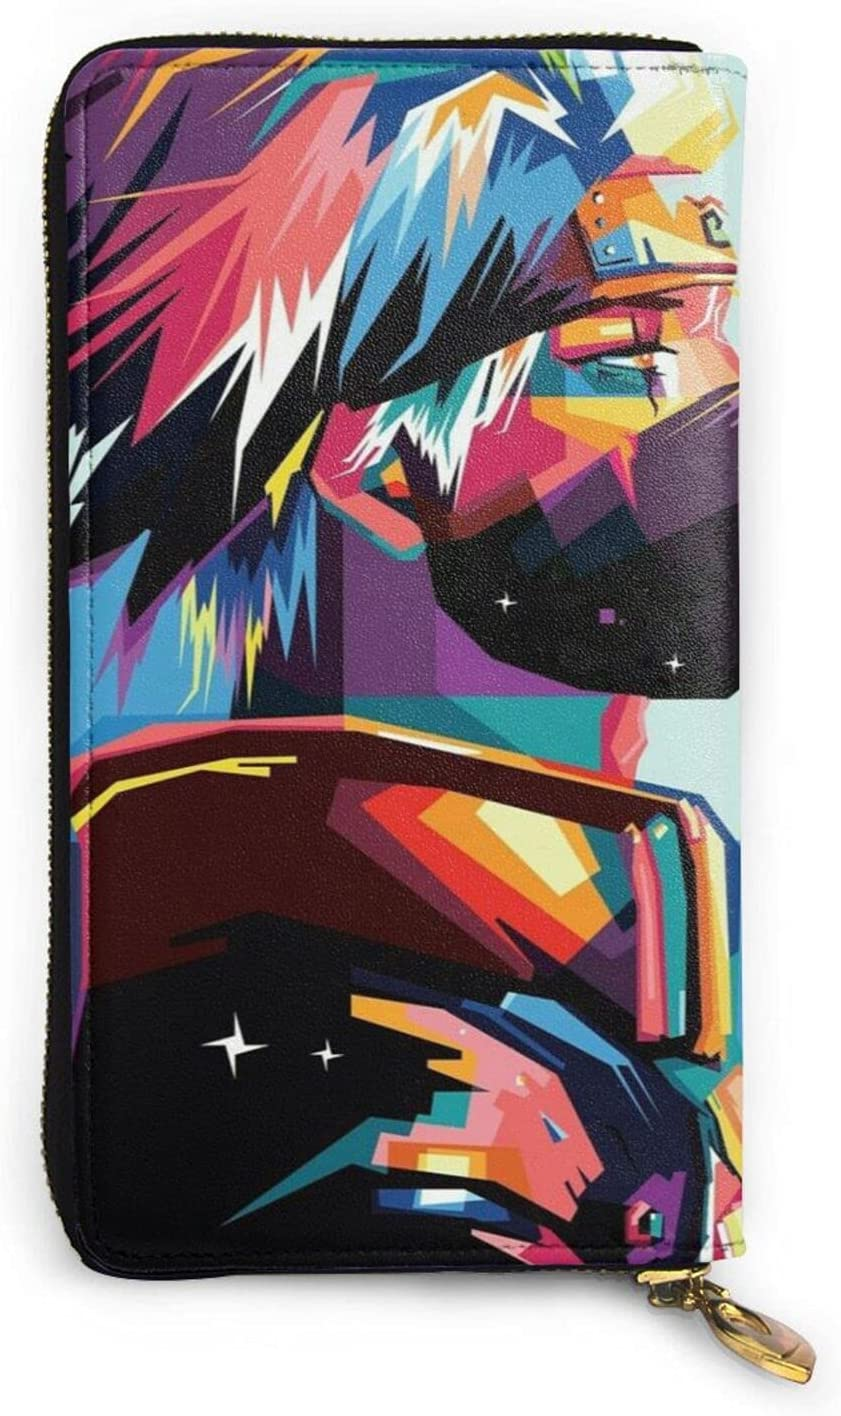 Hatake Kakashi Wallets for Women Men Exquisite Advanced Leather Zip Waterproof Multifunctional Wallet Clutch Bag